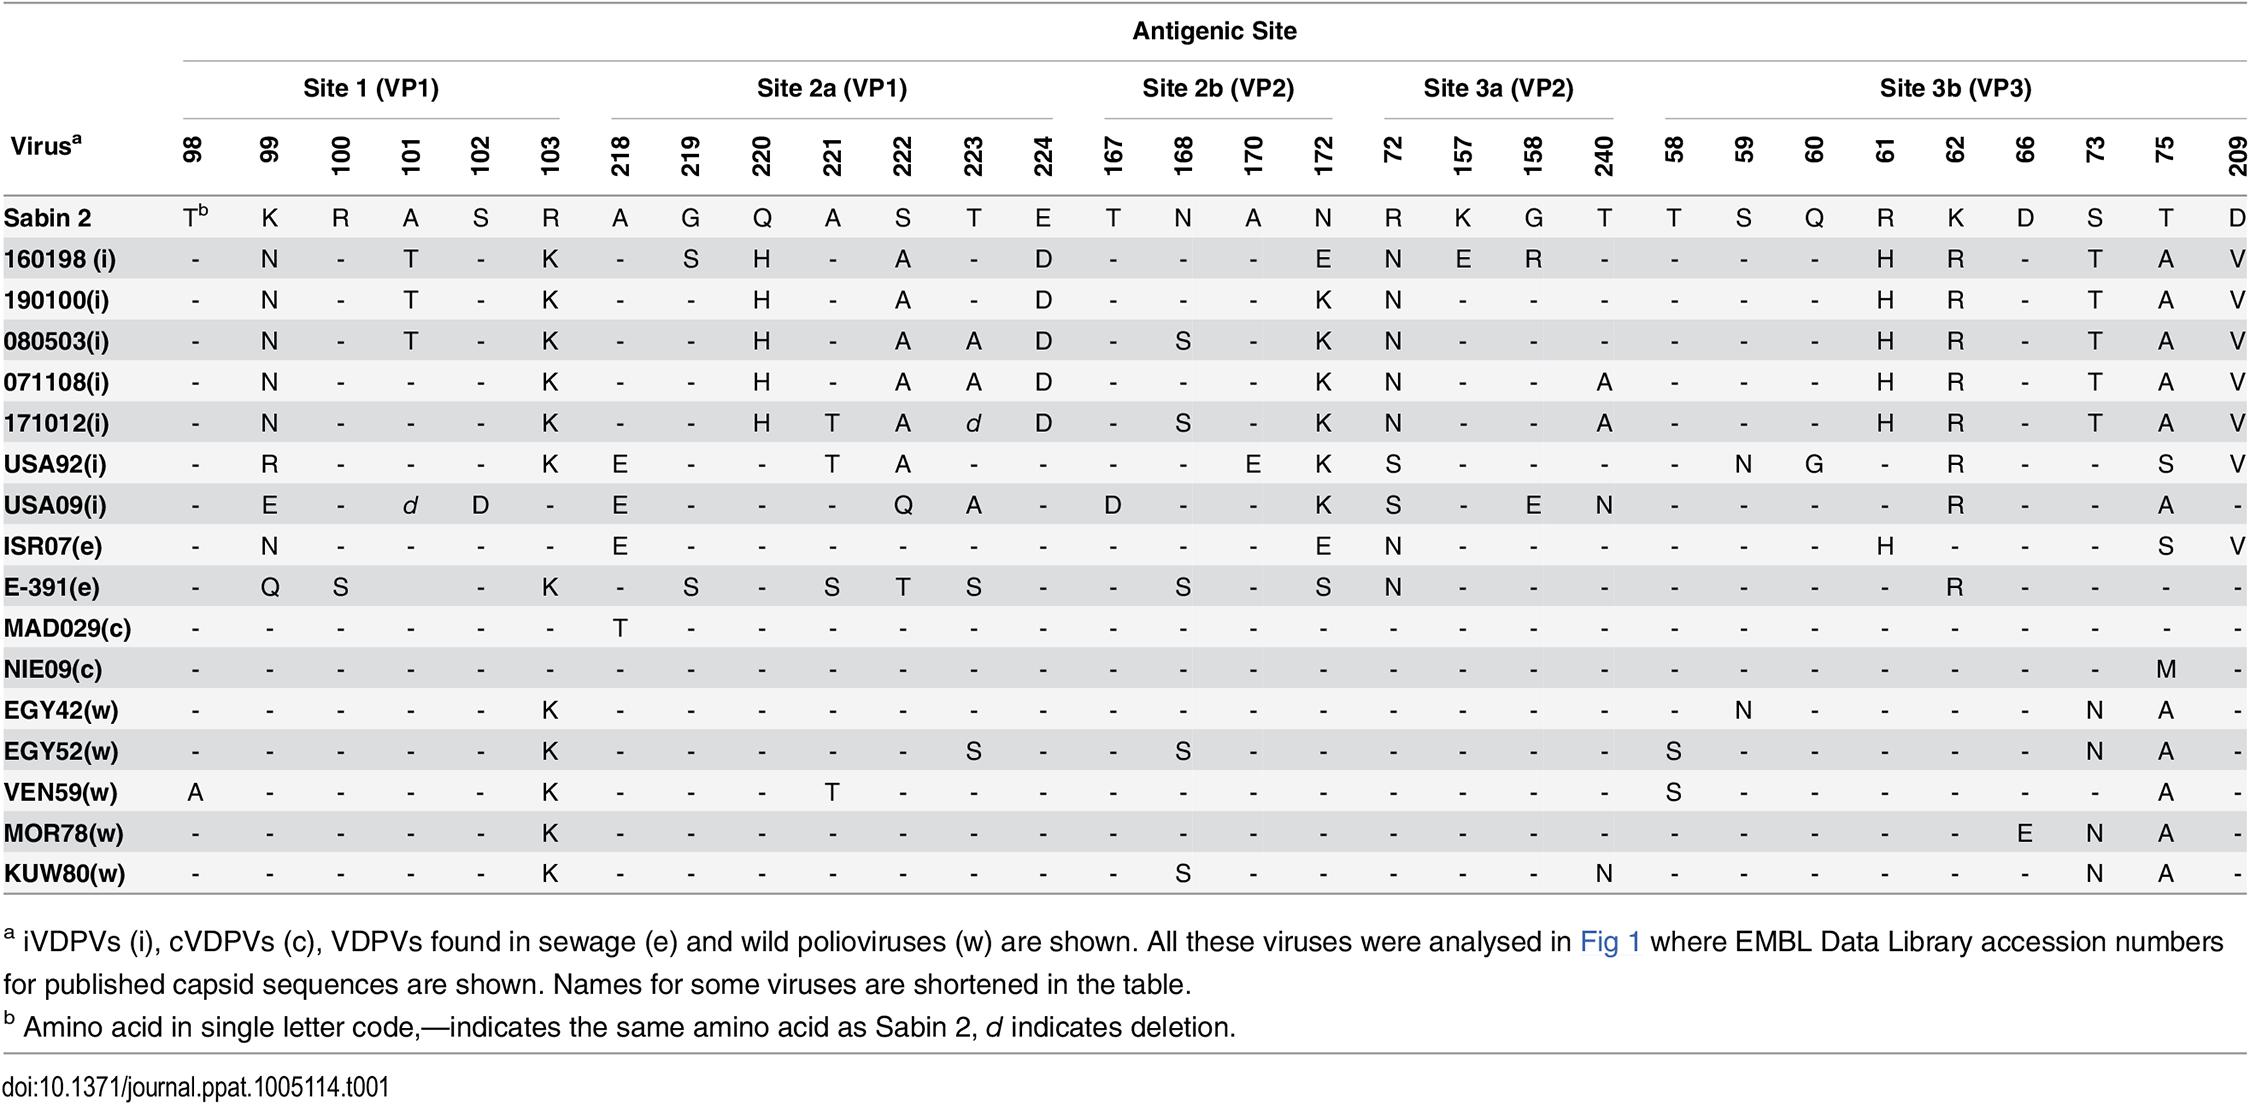 Amino acid differences in antigenic sites between type 2 polioviruses.